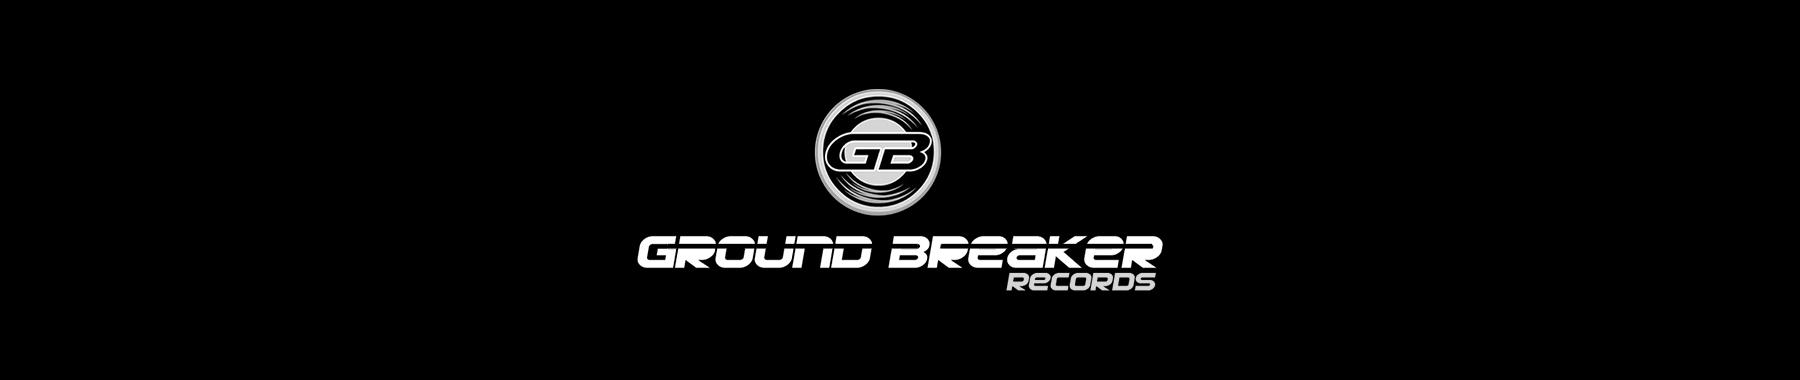 gb records.jpg